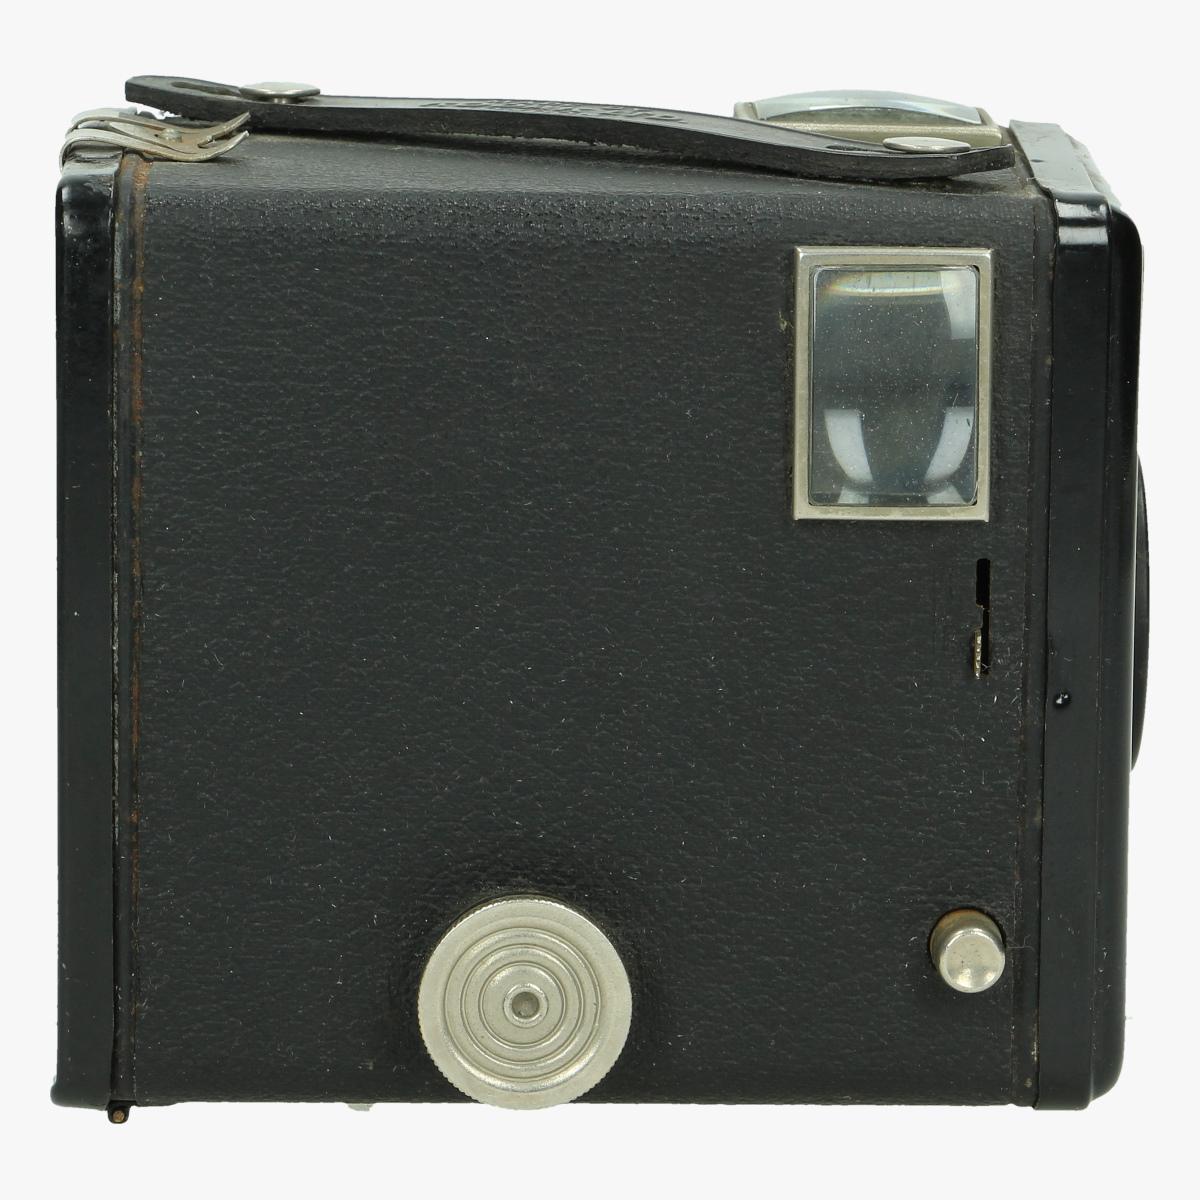 Afbeeldingen van fotocamera kodak ltd london six-20  brownie c